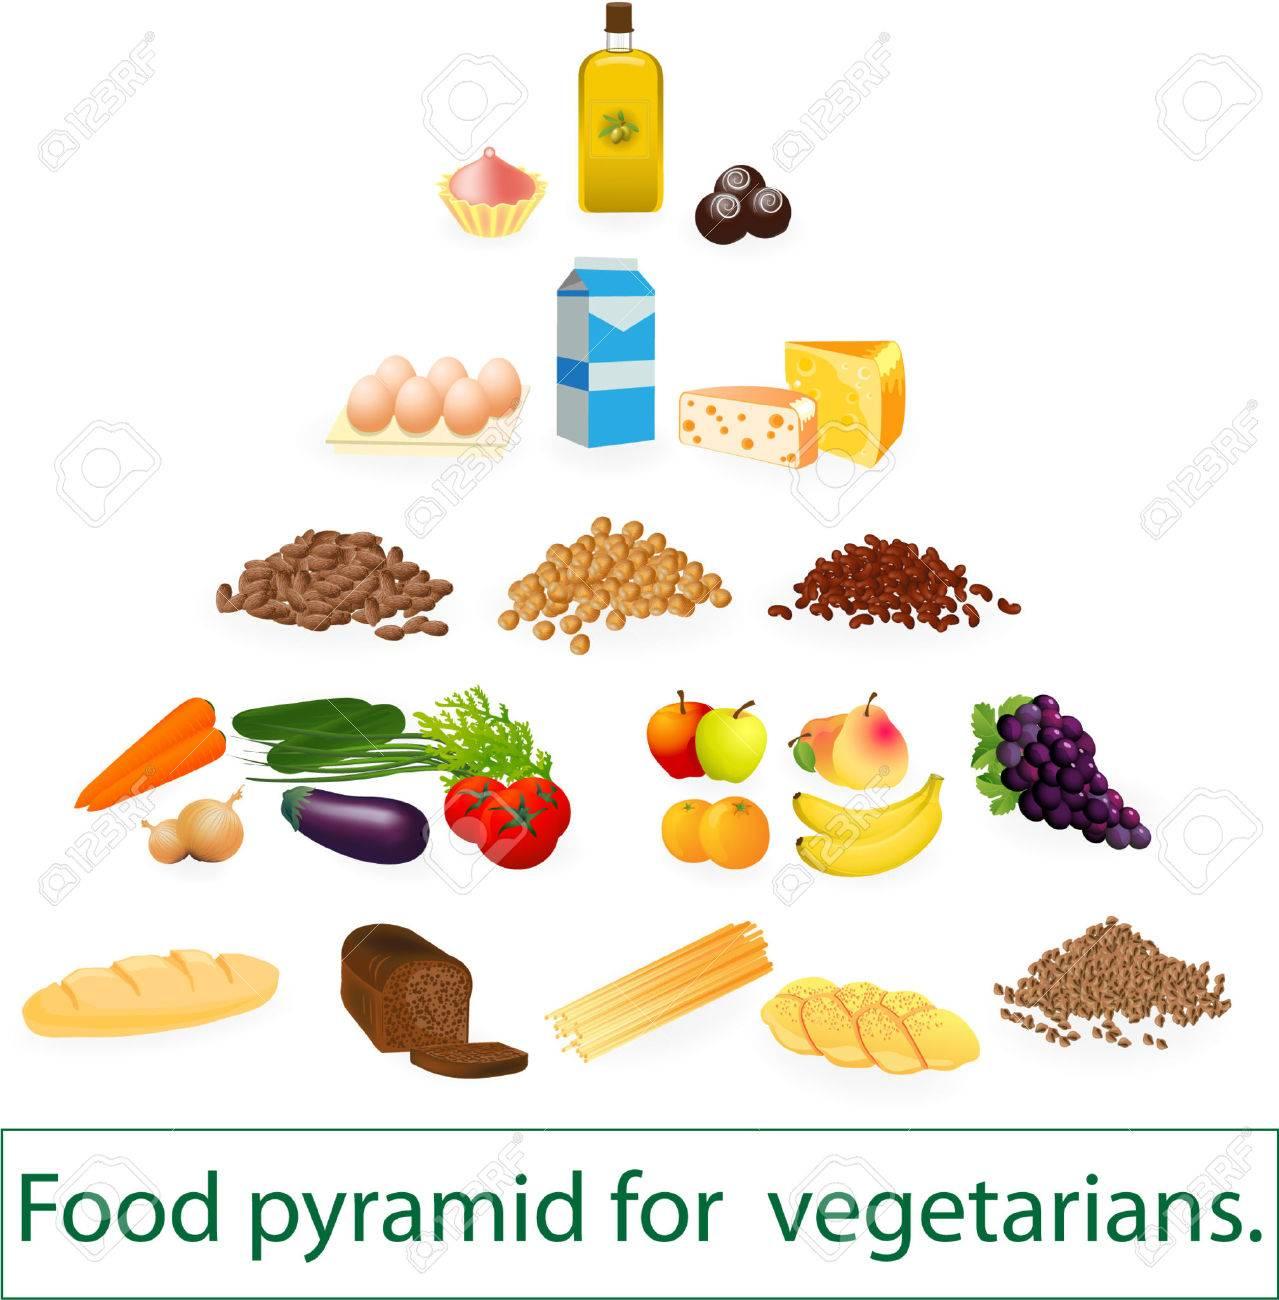 Food pyramid for vegetarians. - 8022776